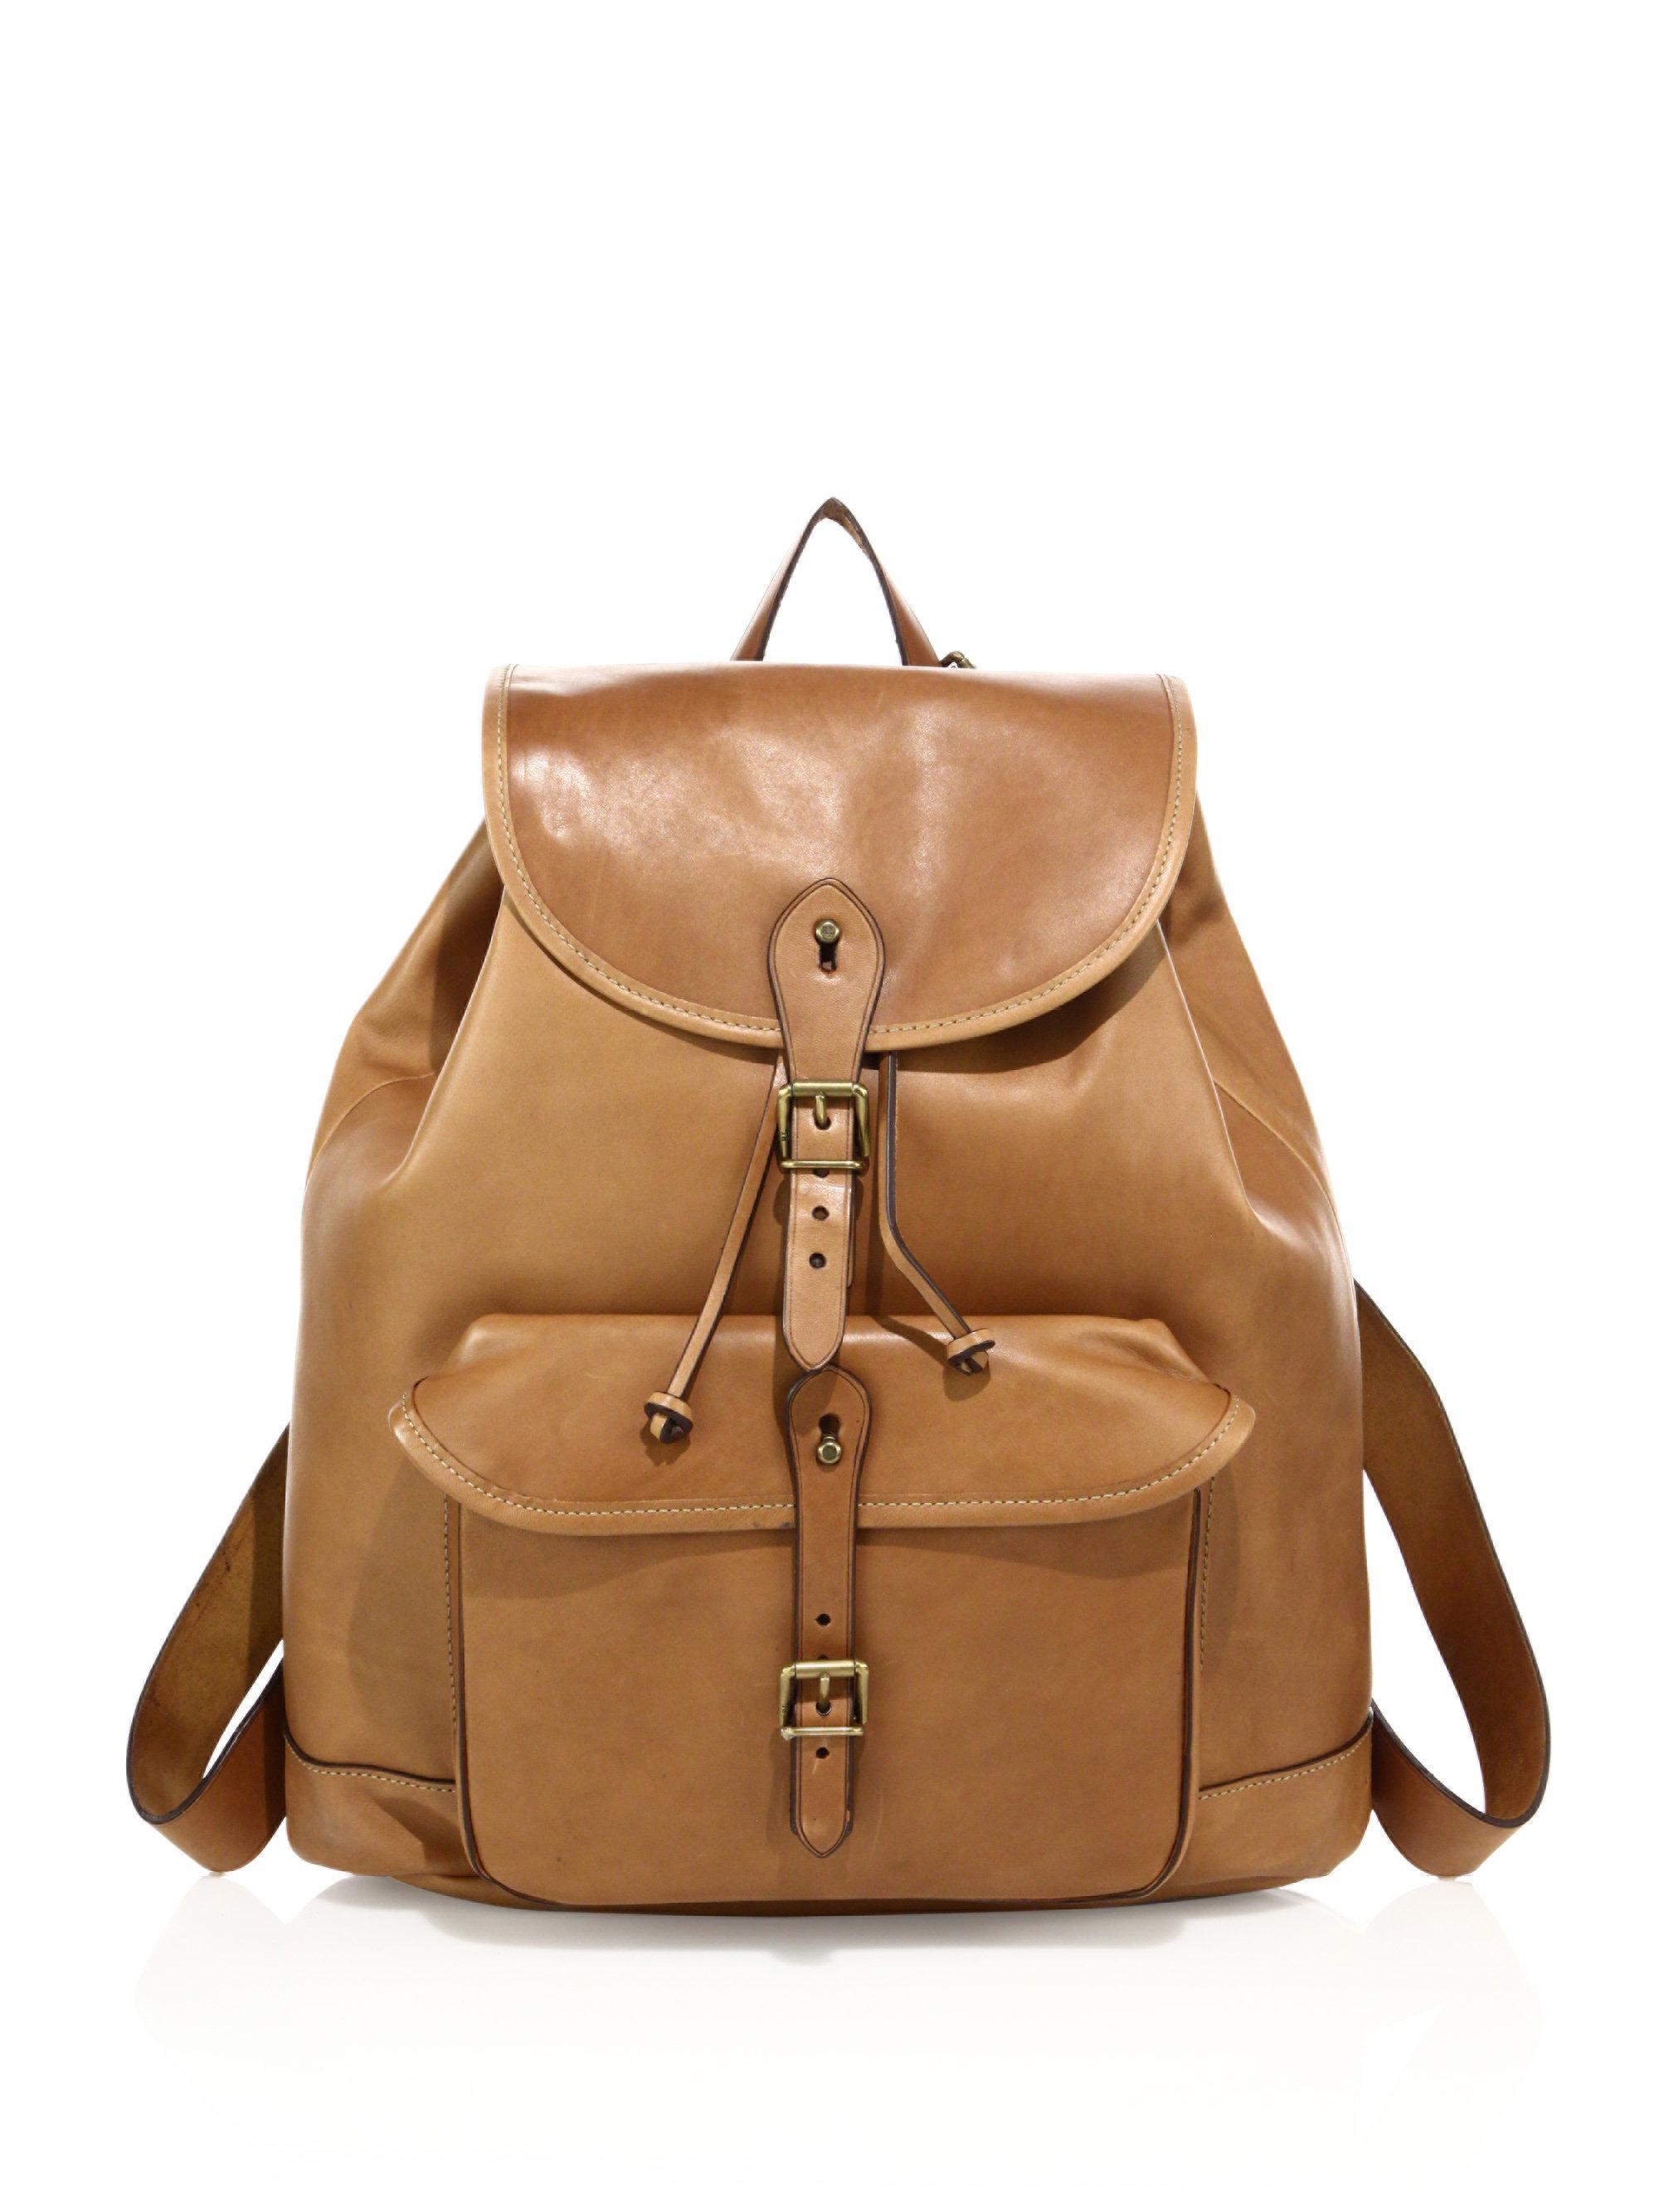 1a55eddb2c74 Lyst - Polo Ralph Lauren Drawstring Leather Backpack for Men